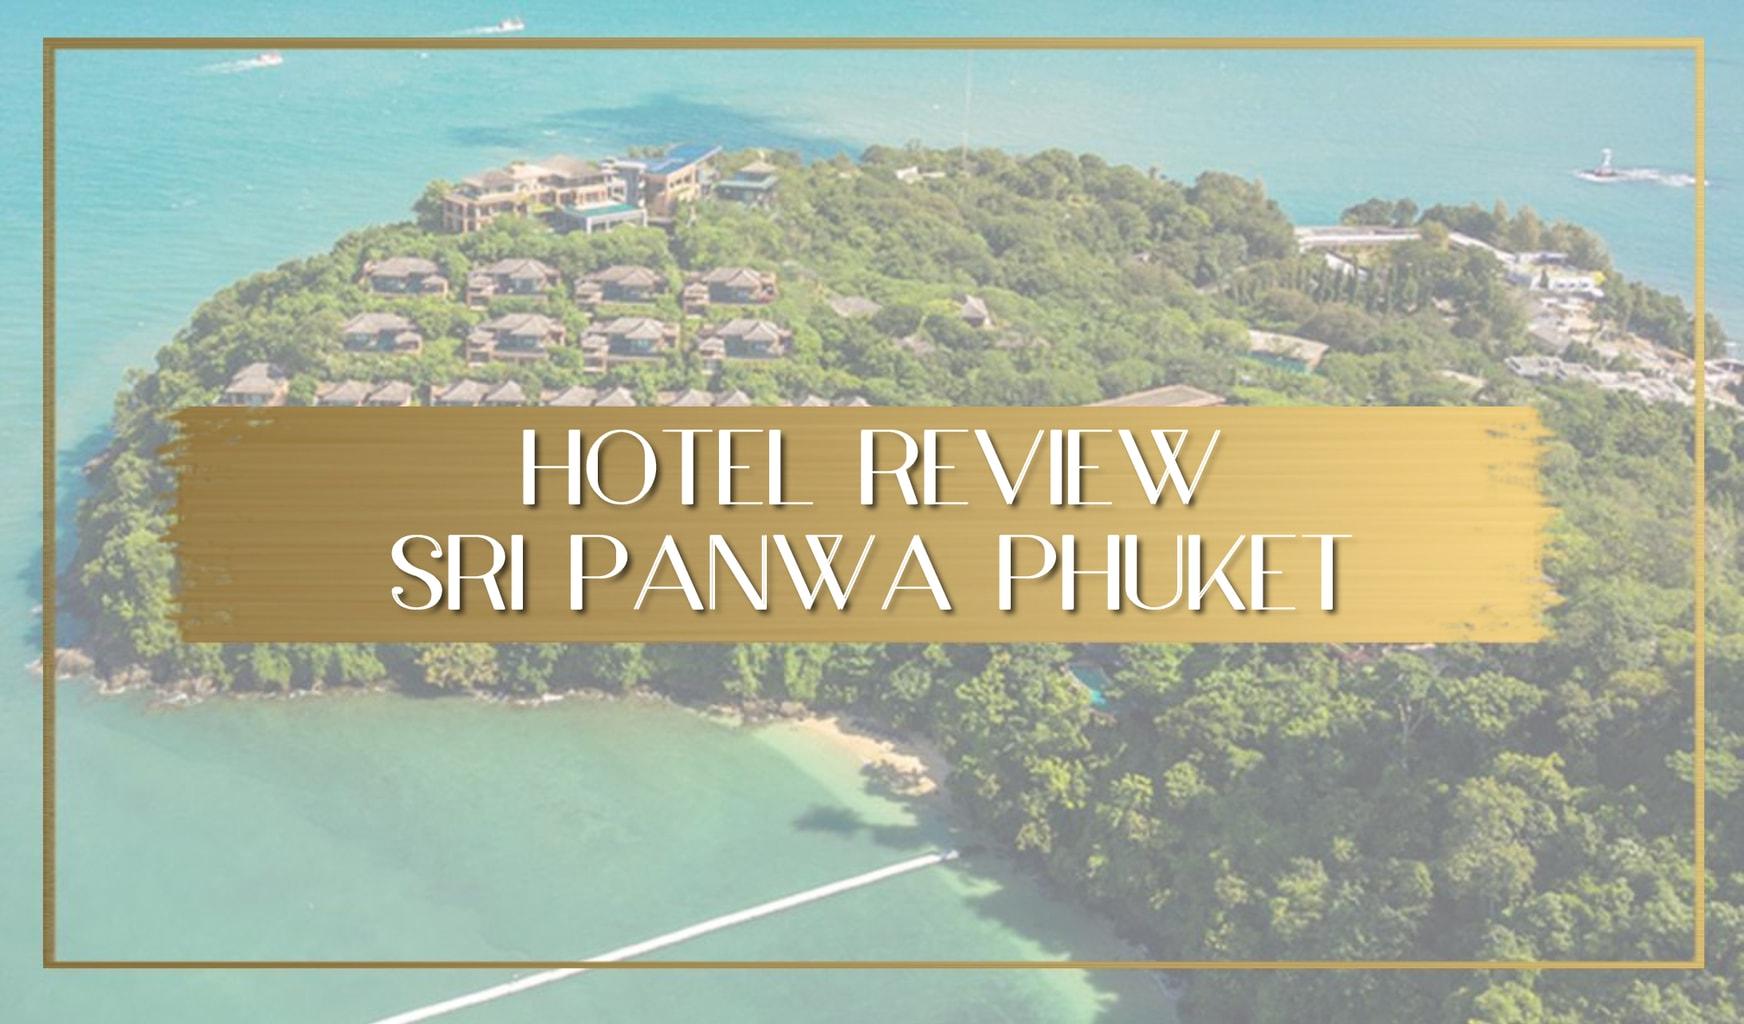 Review of Sri Panwa Phuket main